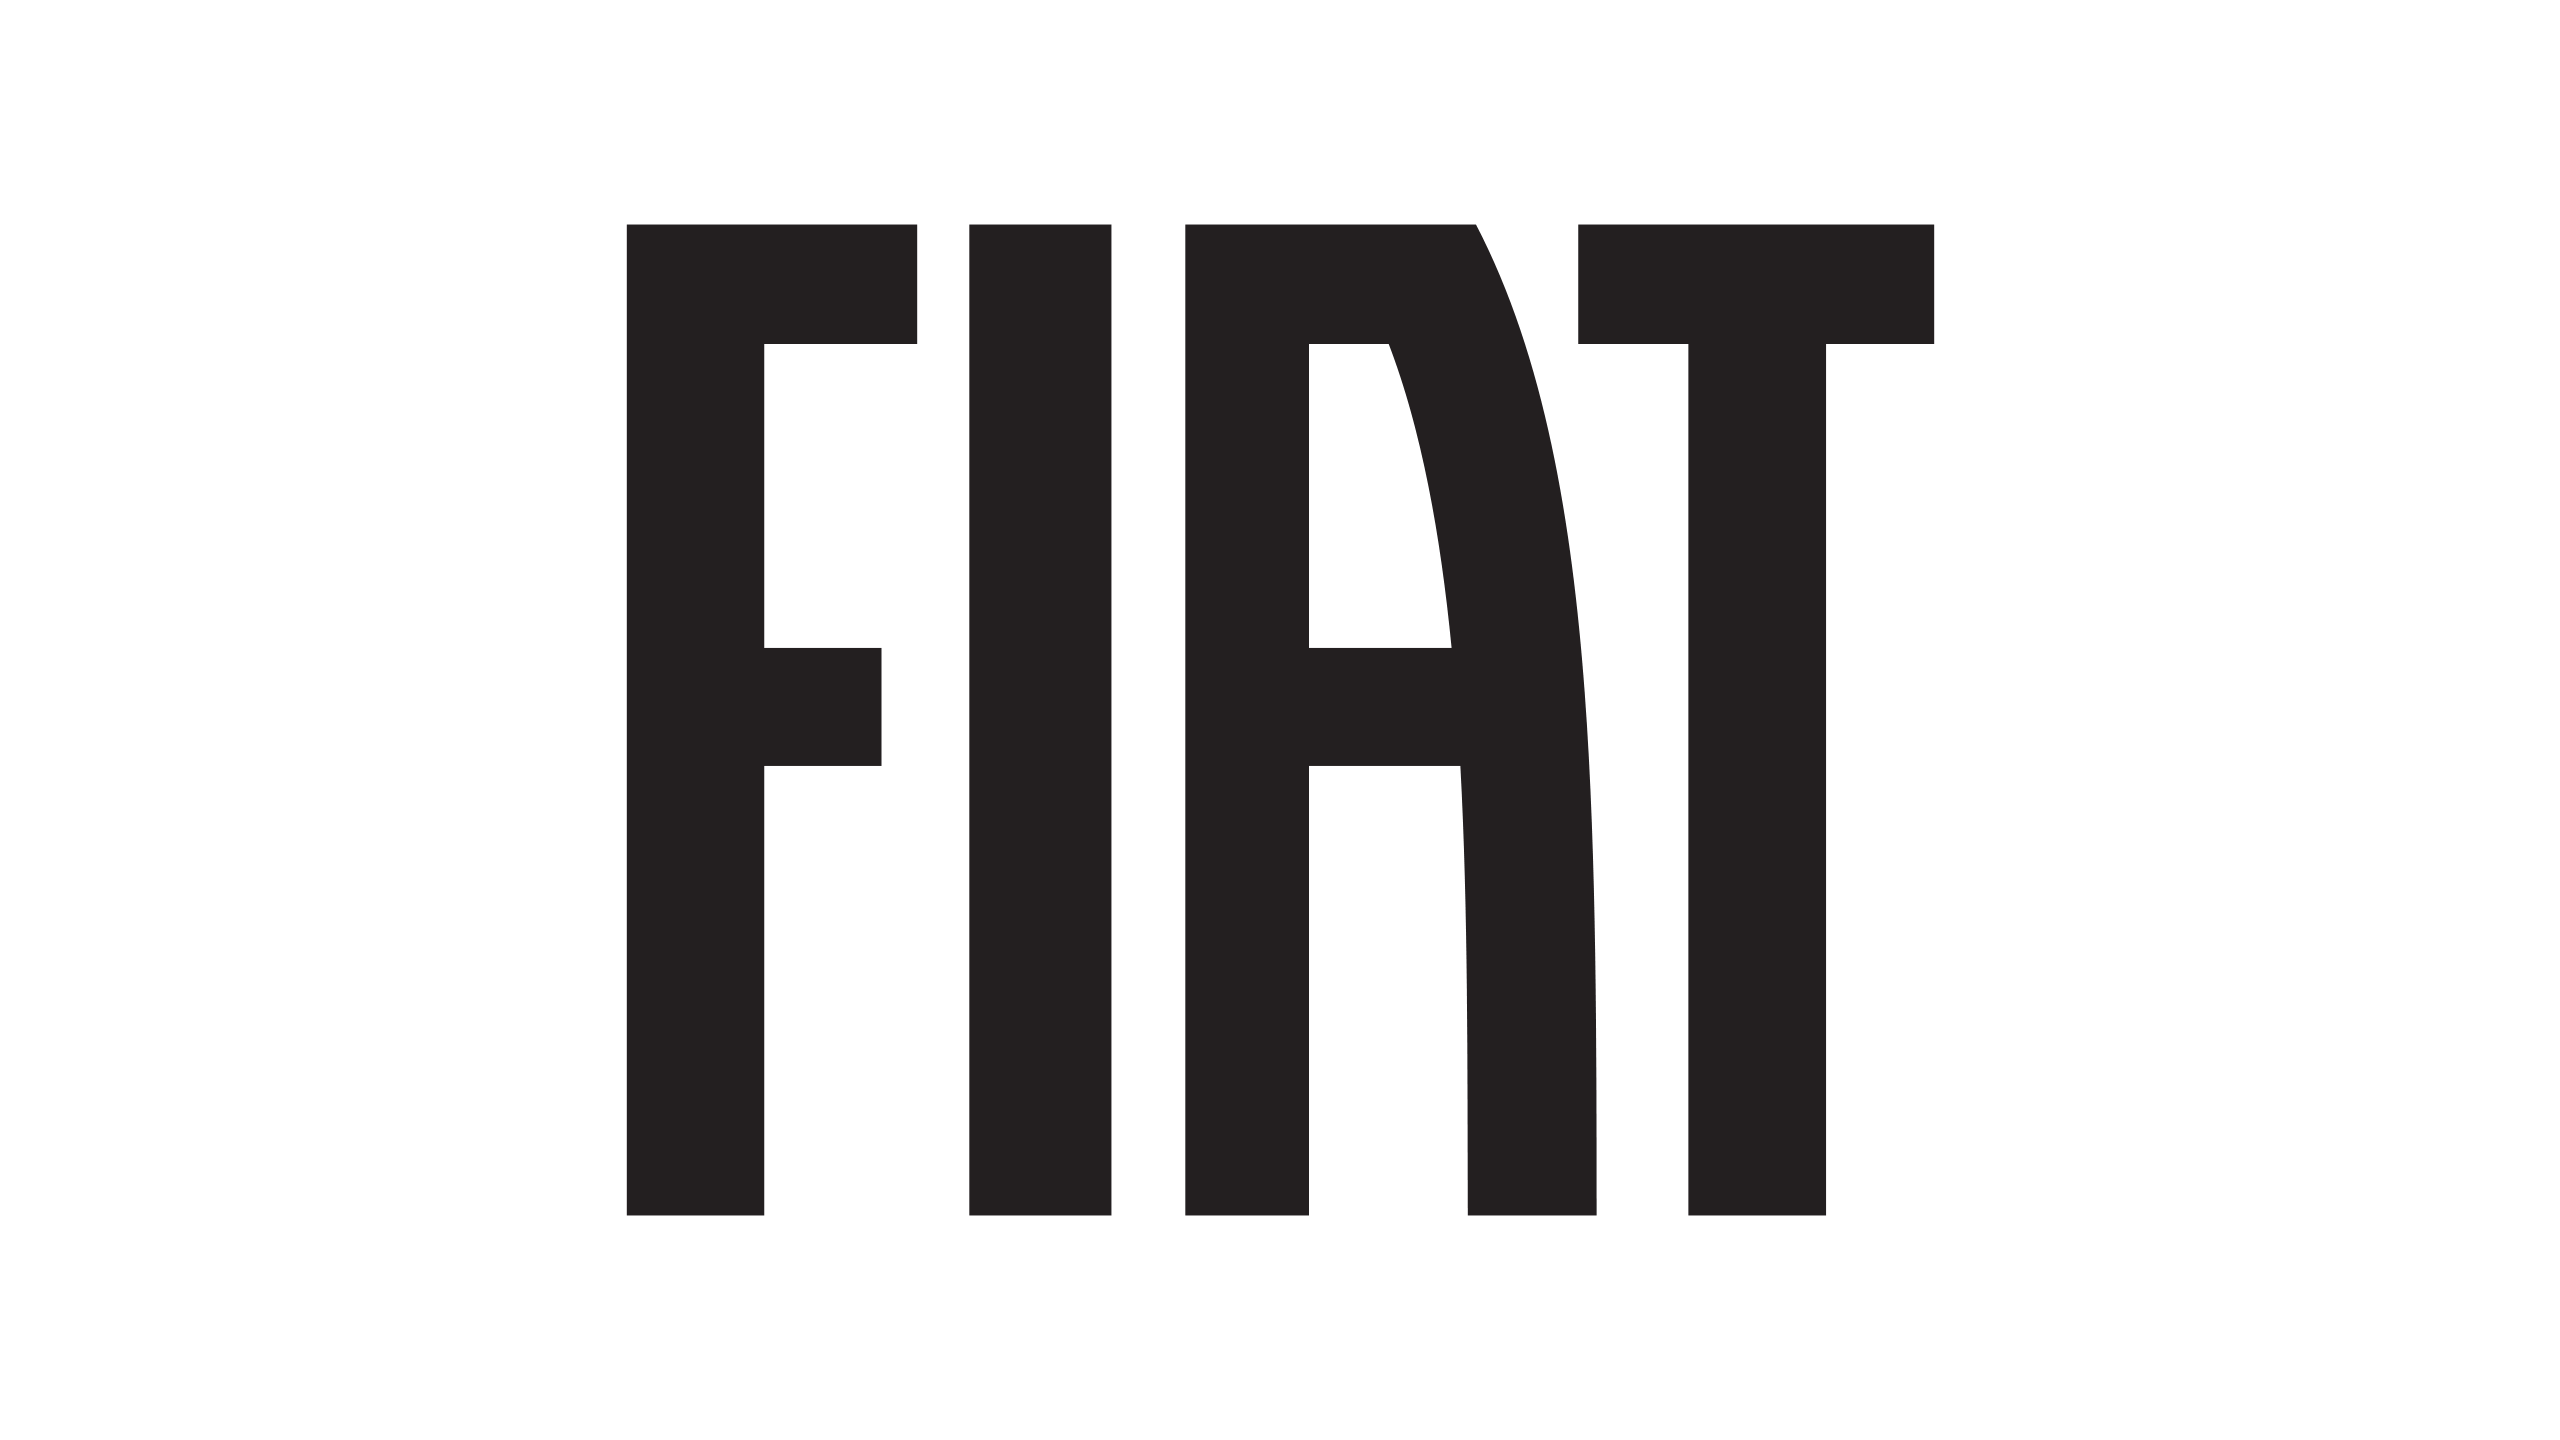 fiat logo freigestellt